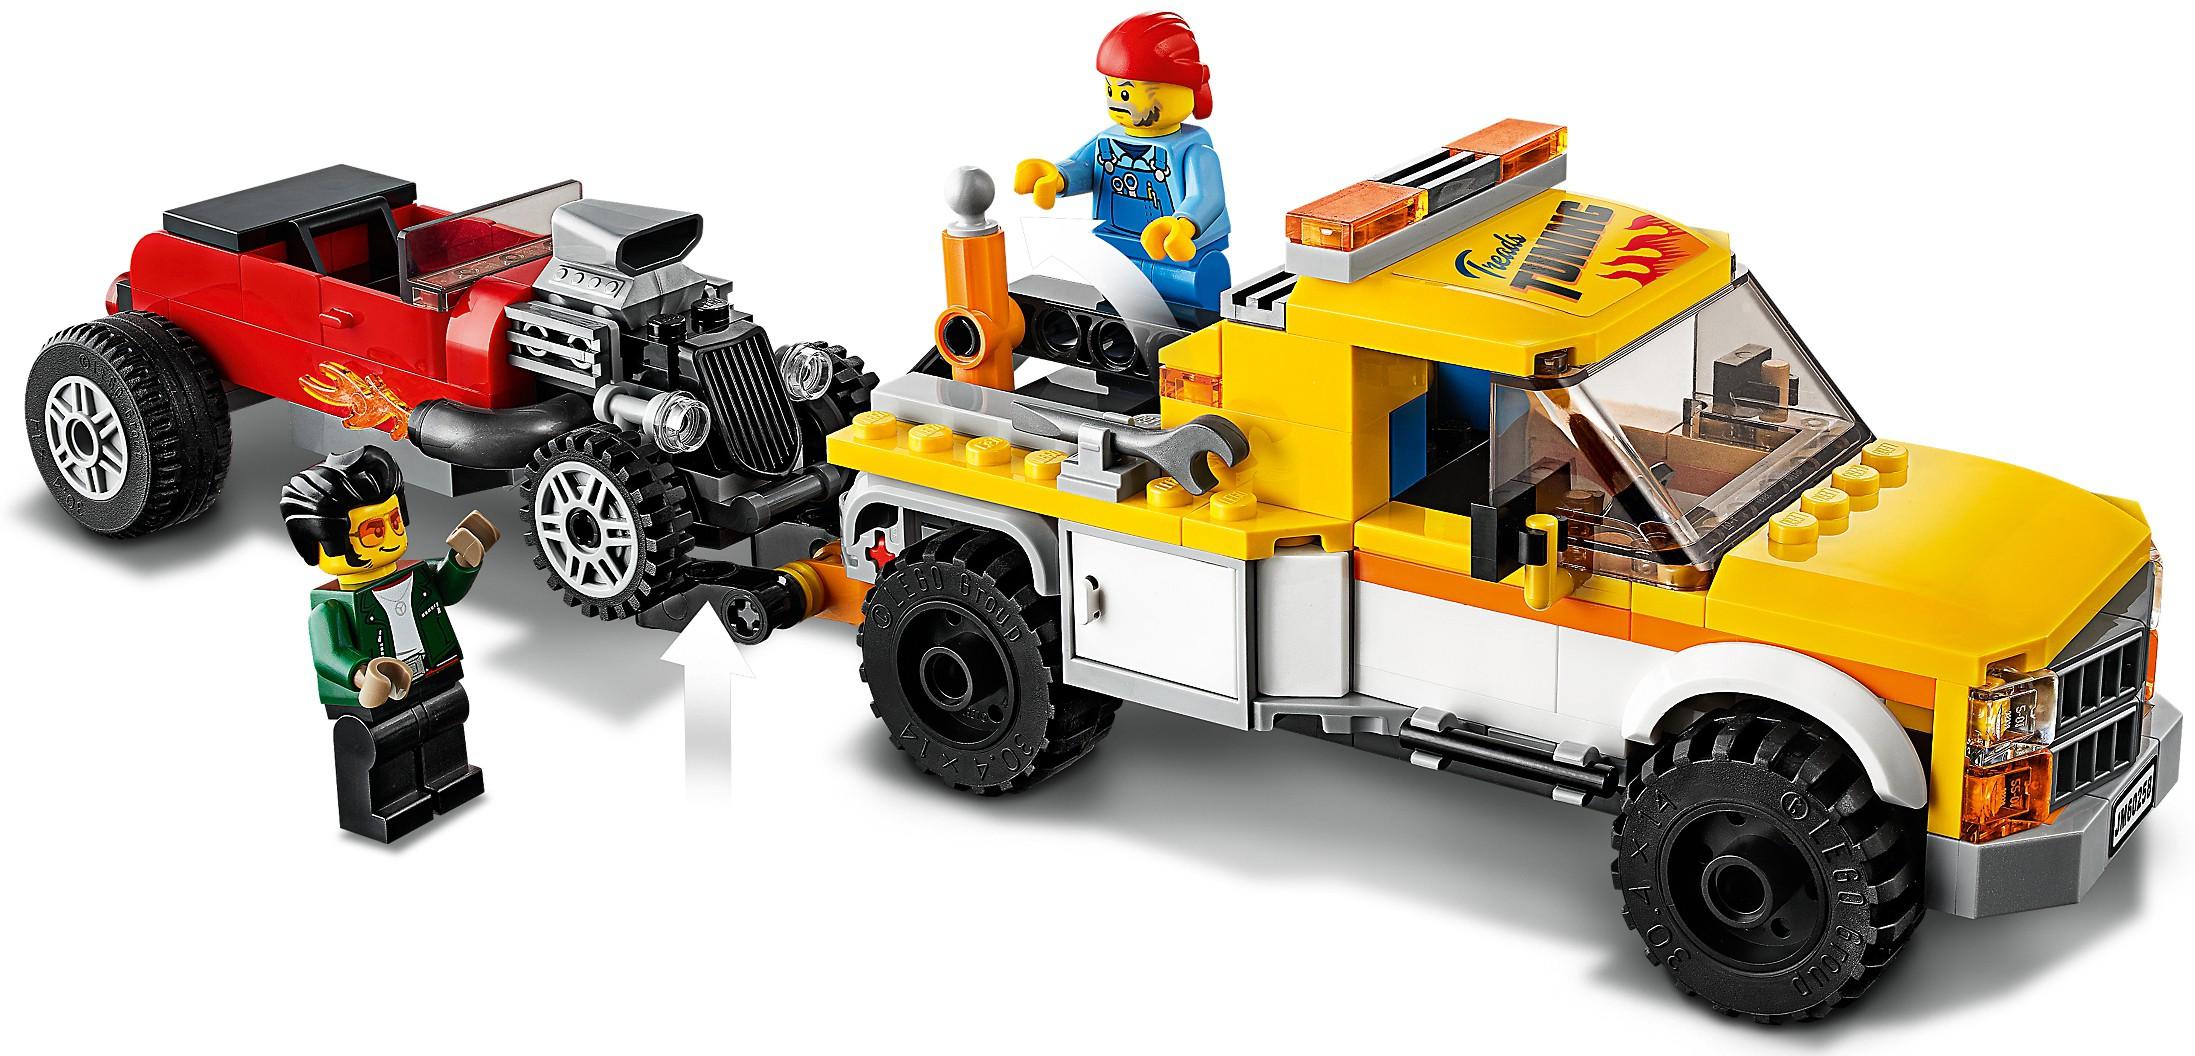 LEGO 60258 Tuning Workshop CITY - BrickBuilder Australia LEGO® SHOP